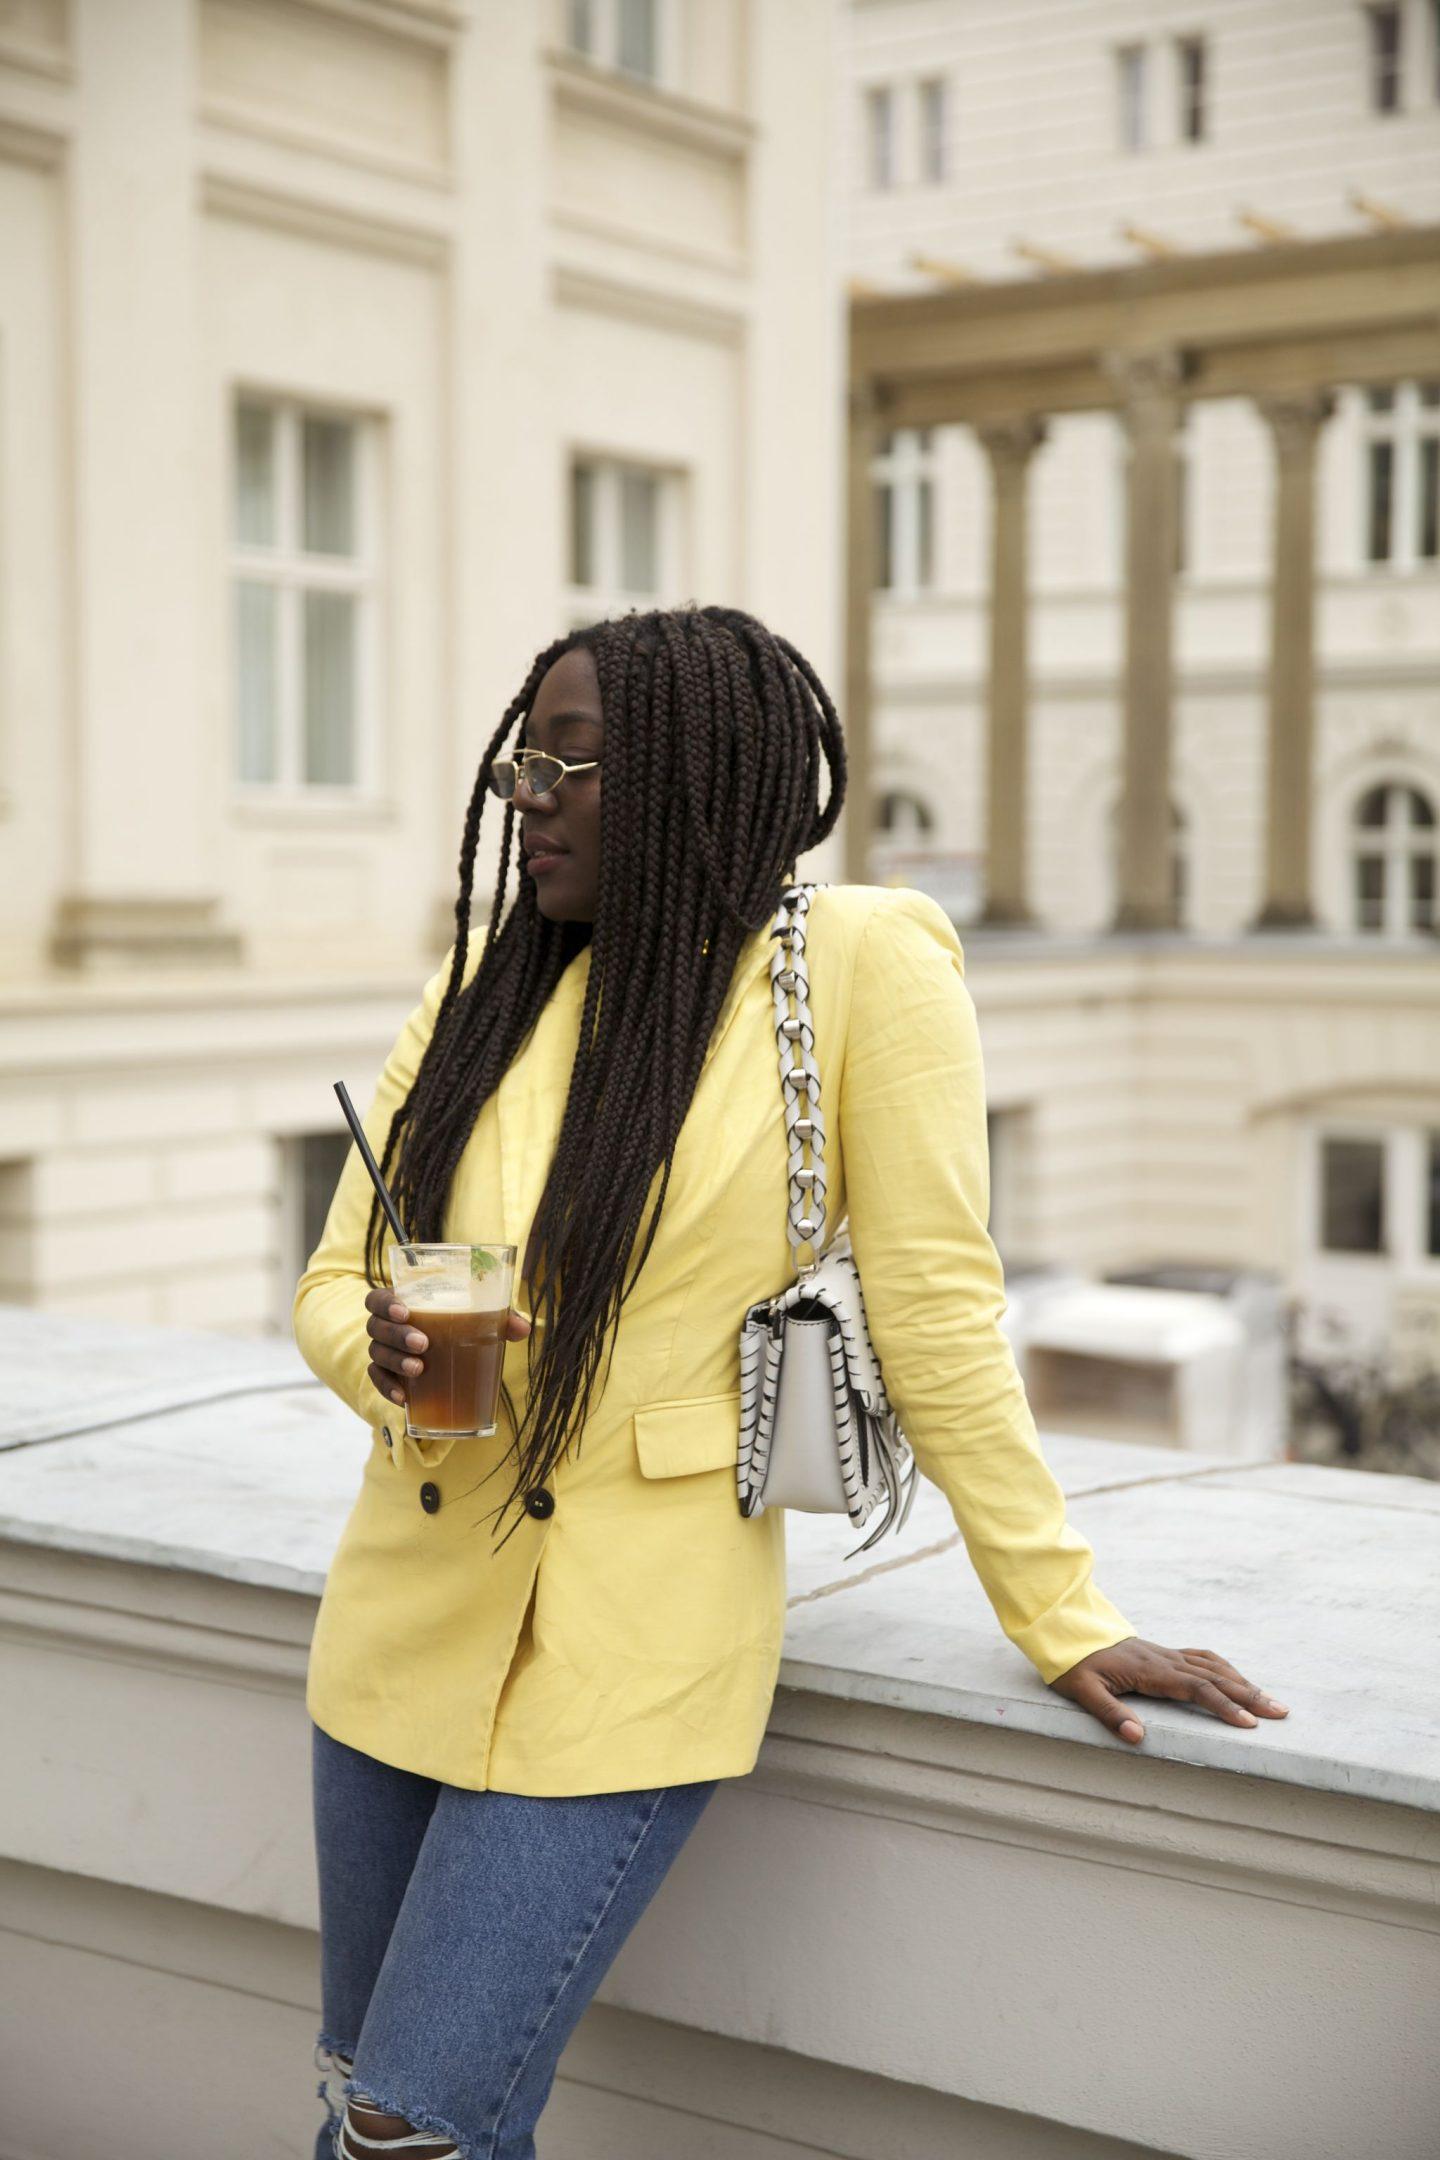 Lois Opoku proenza schouler hava whipstitch bag street style Nespresso lisforlois_9